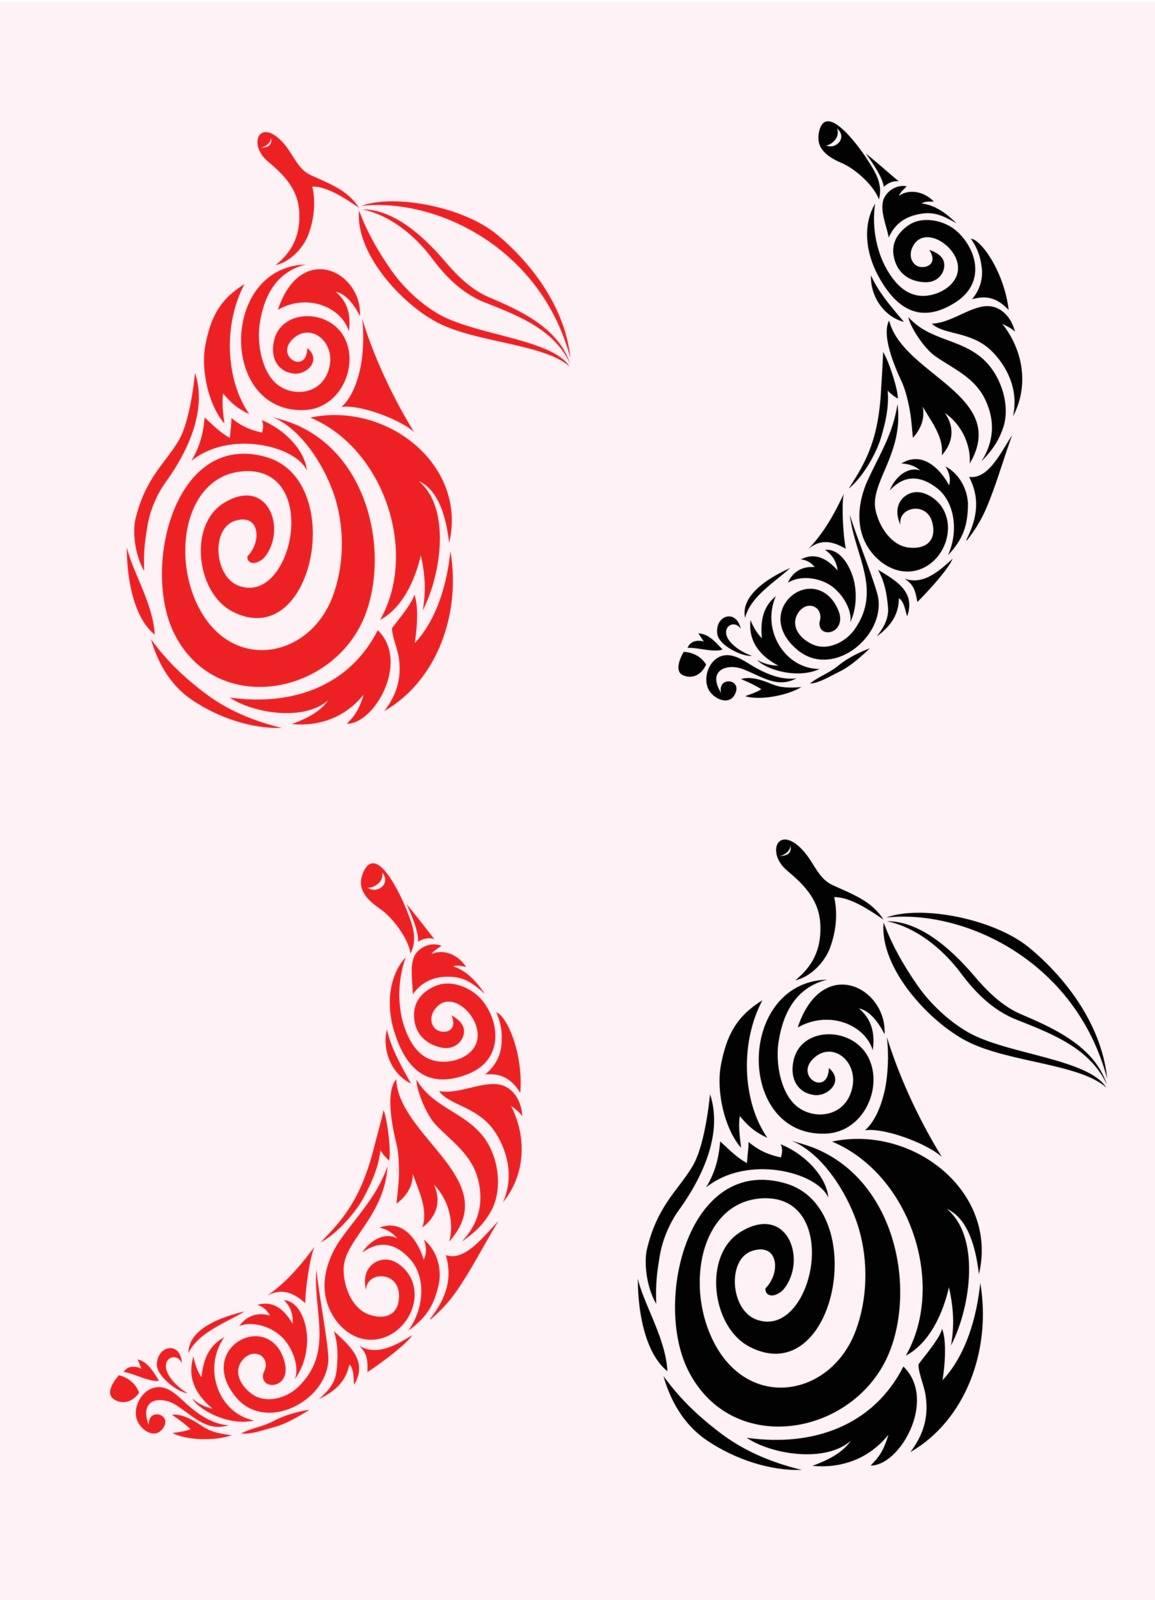 Banana and peer ornate, art vector decoration